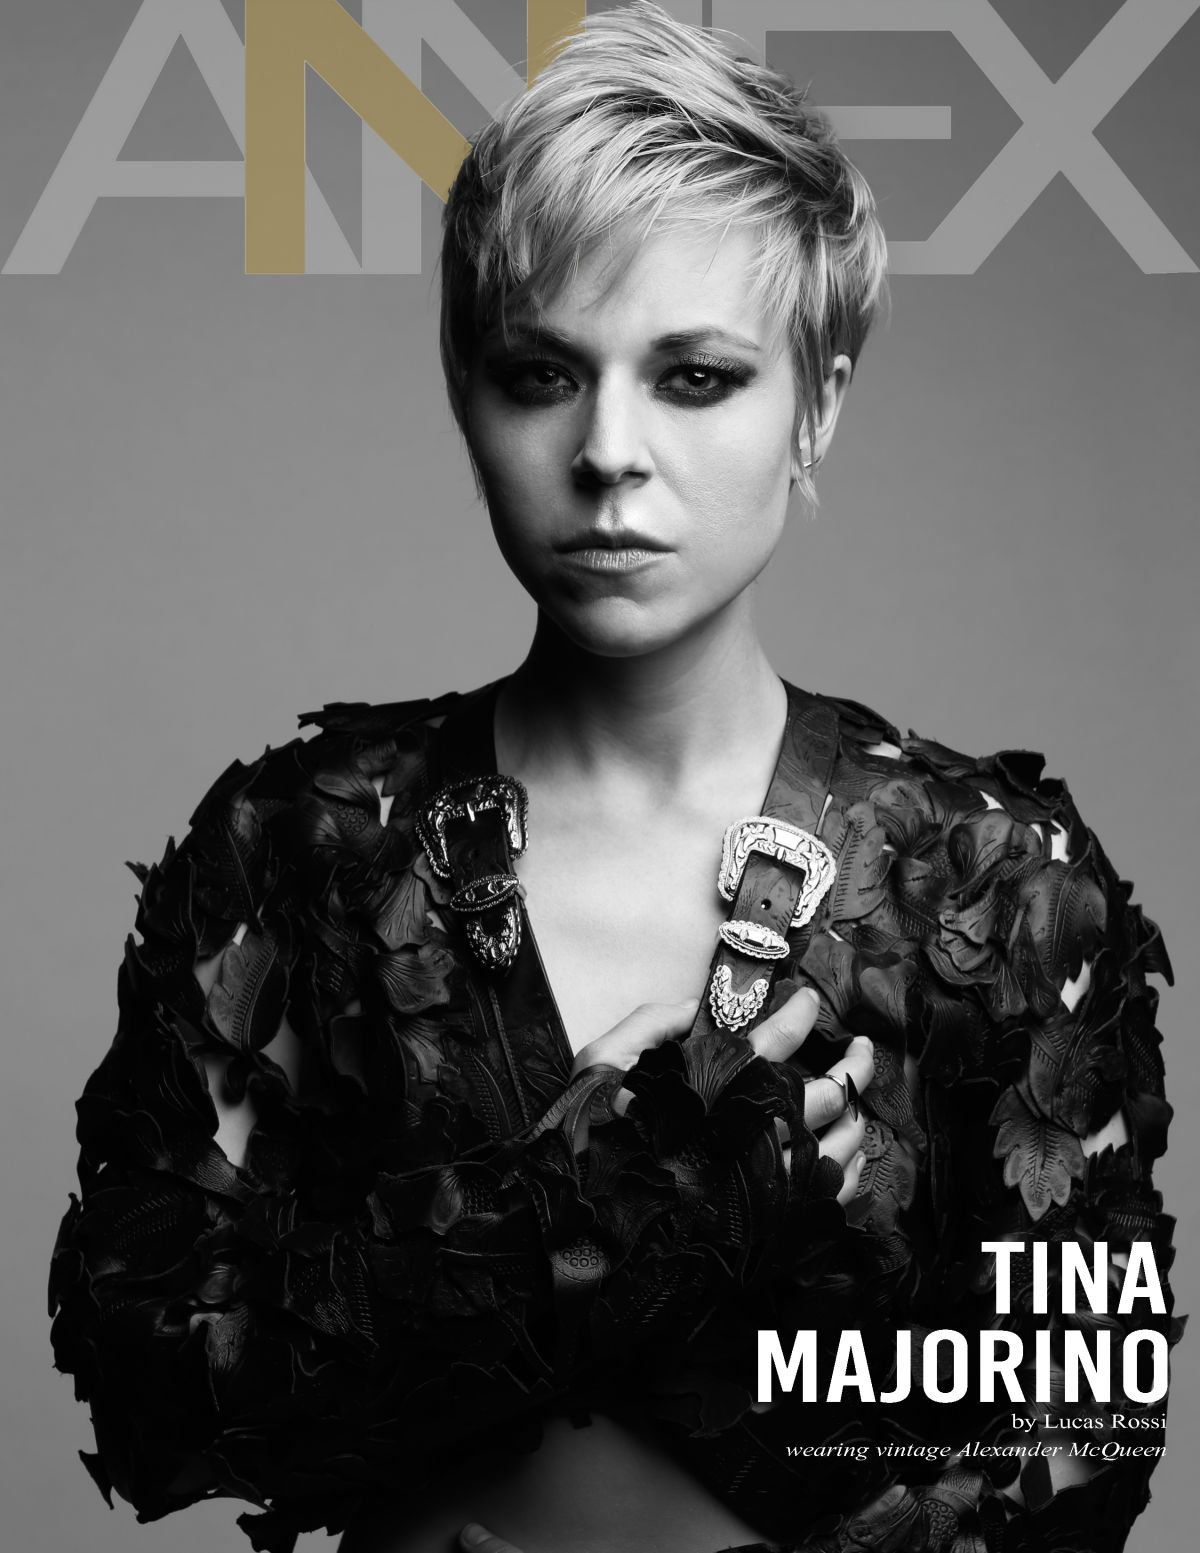 TINA MAJORINO in Annex Magazine, December 2015 Issue